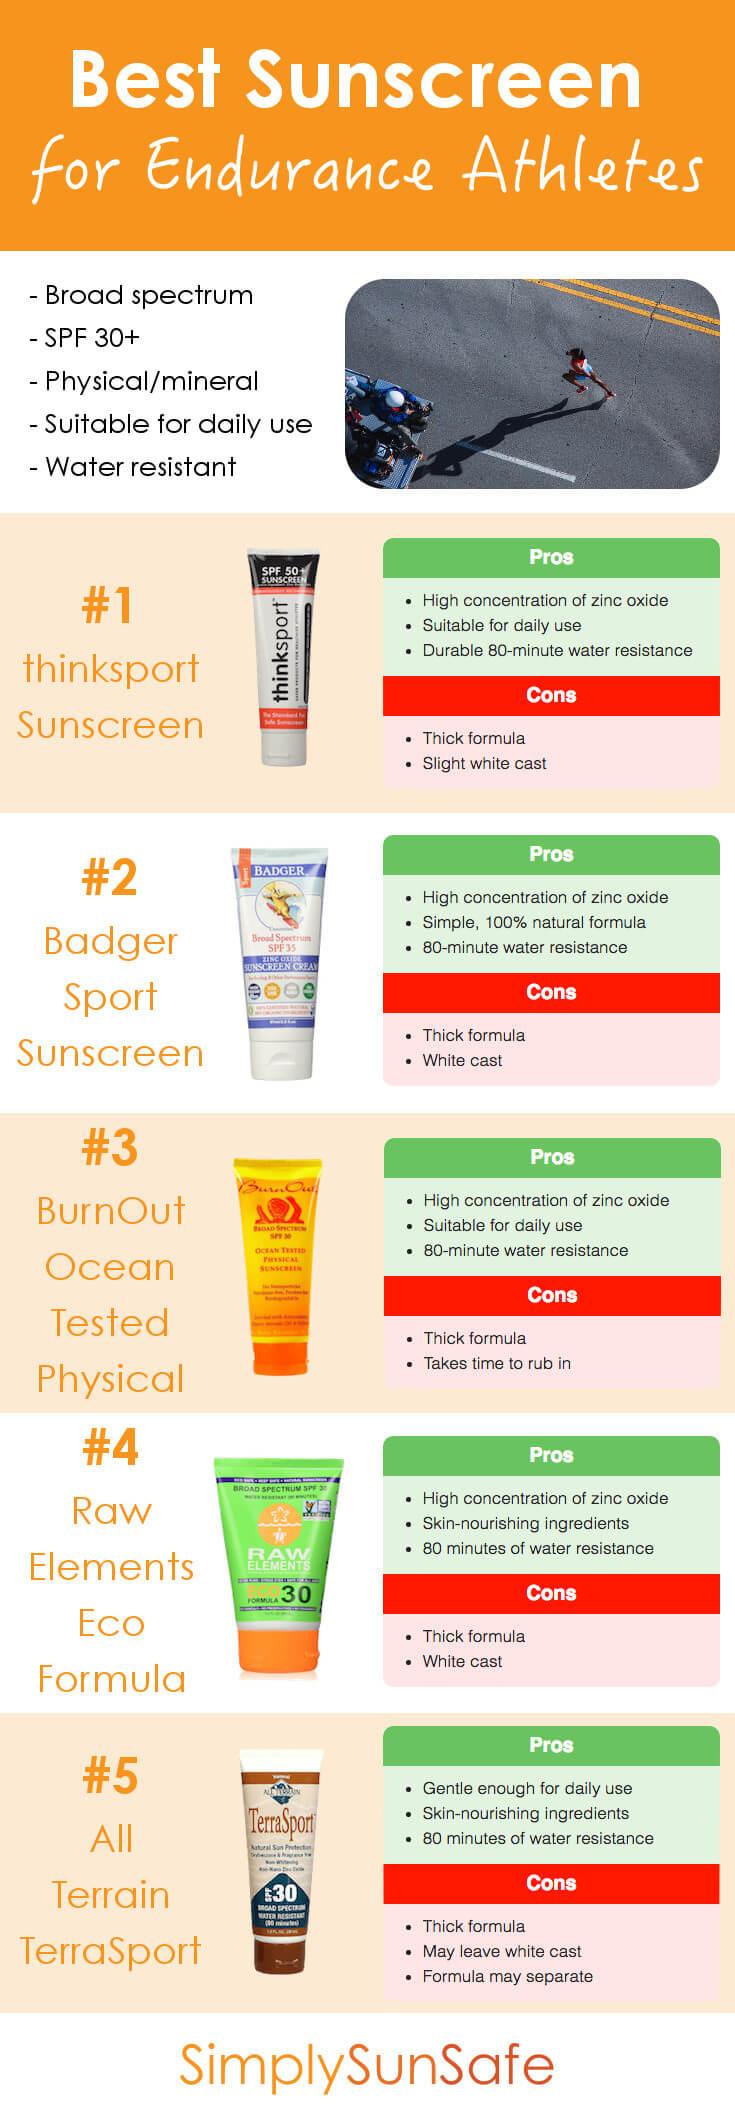 Best Sunscreen for Endurance Athletes Pinterest